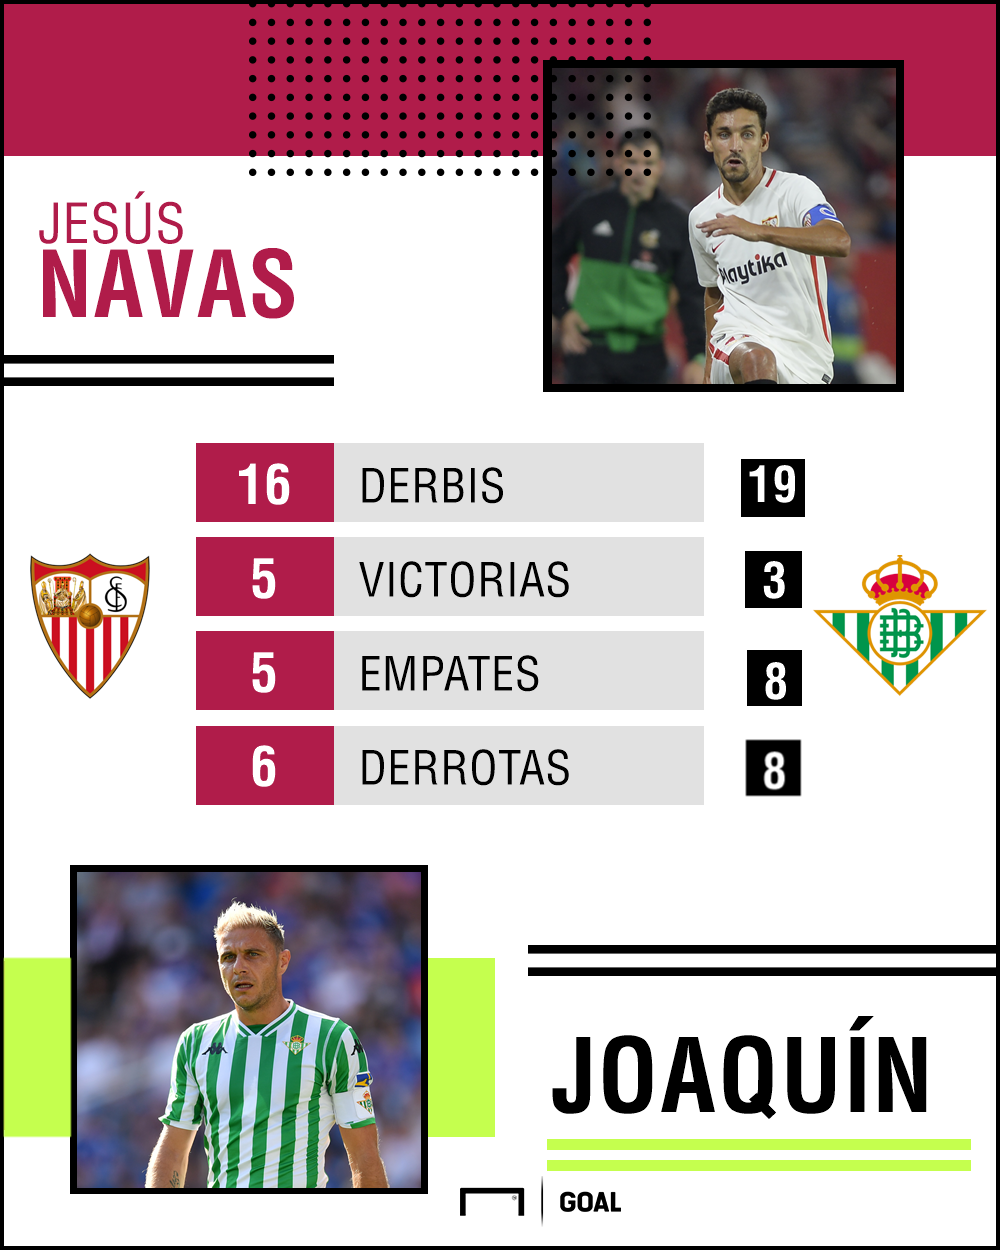 Joaquin vs Navas stats